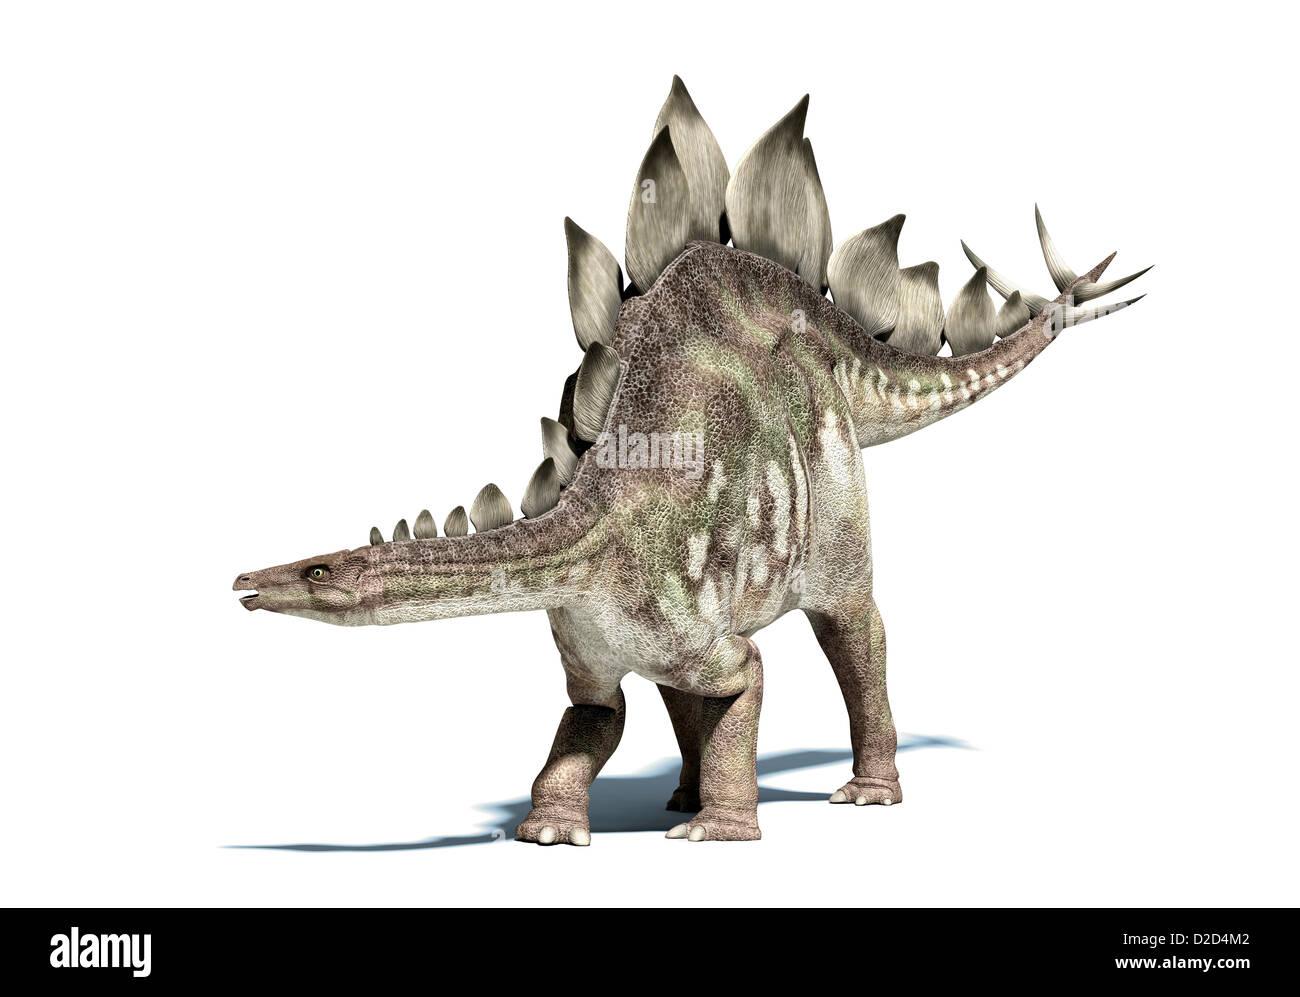 Stegosaurus dinosaur herbivorous dinosaur lived during the Upper Jurassic period - Stock Image